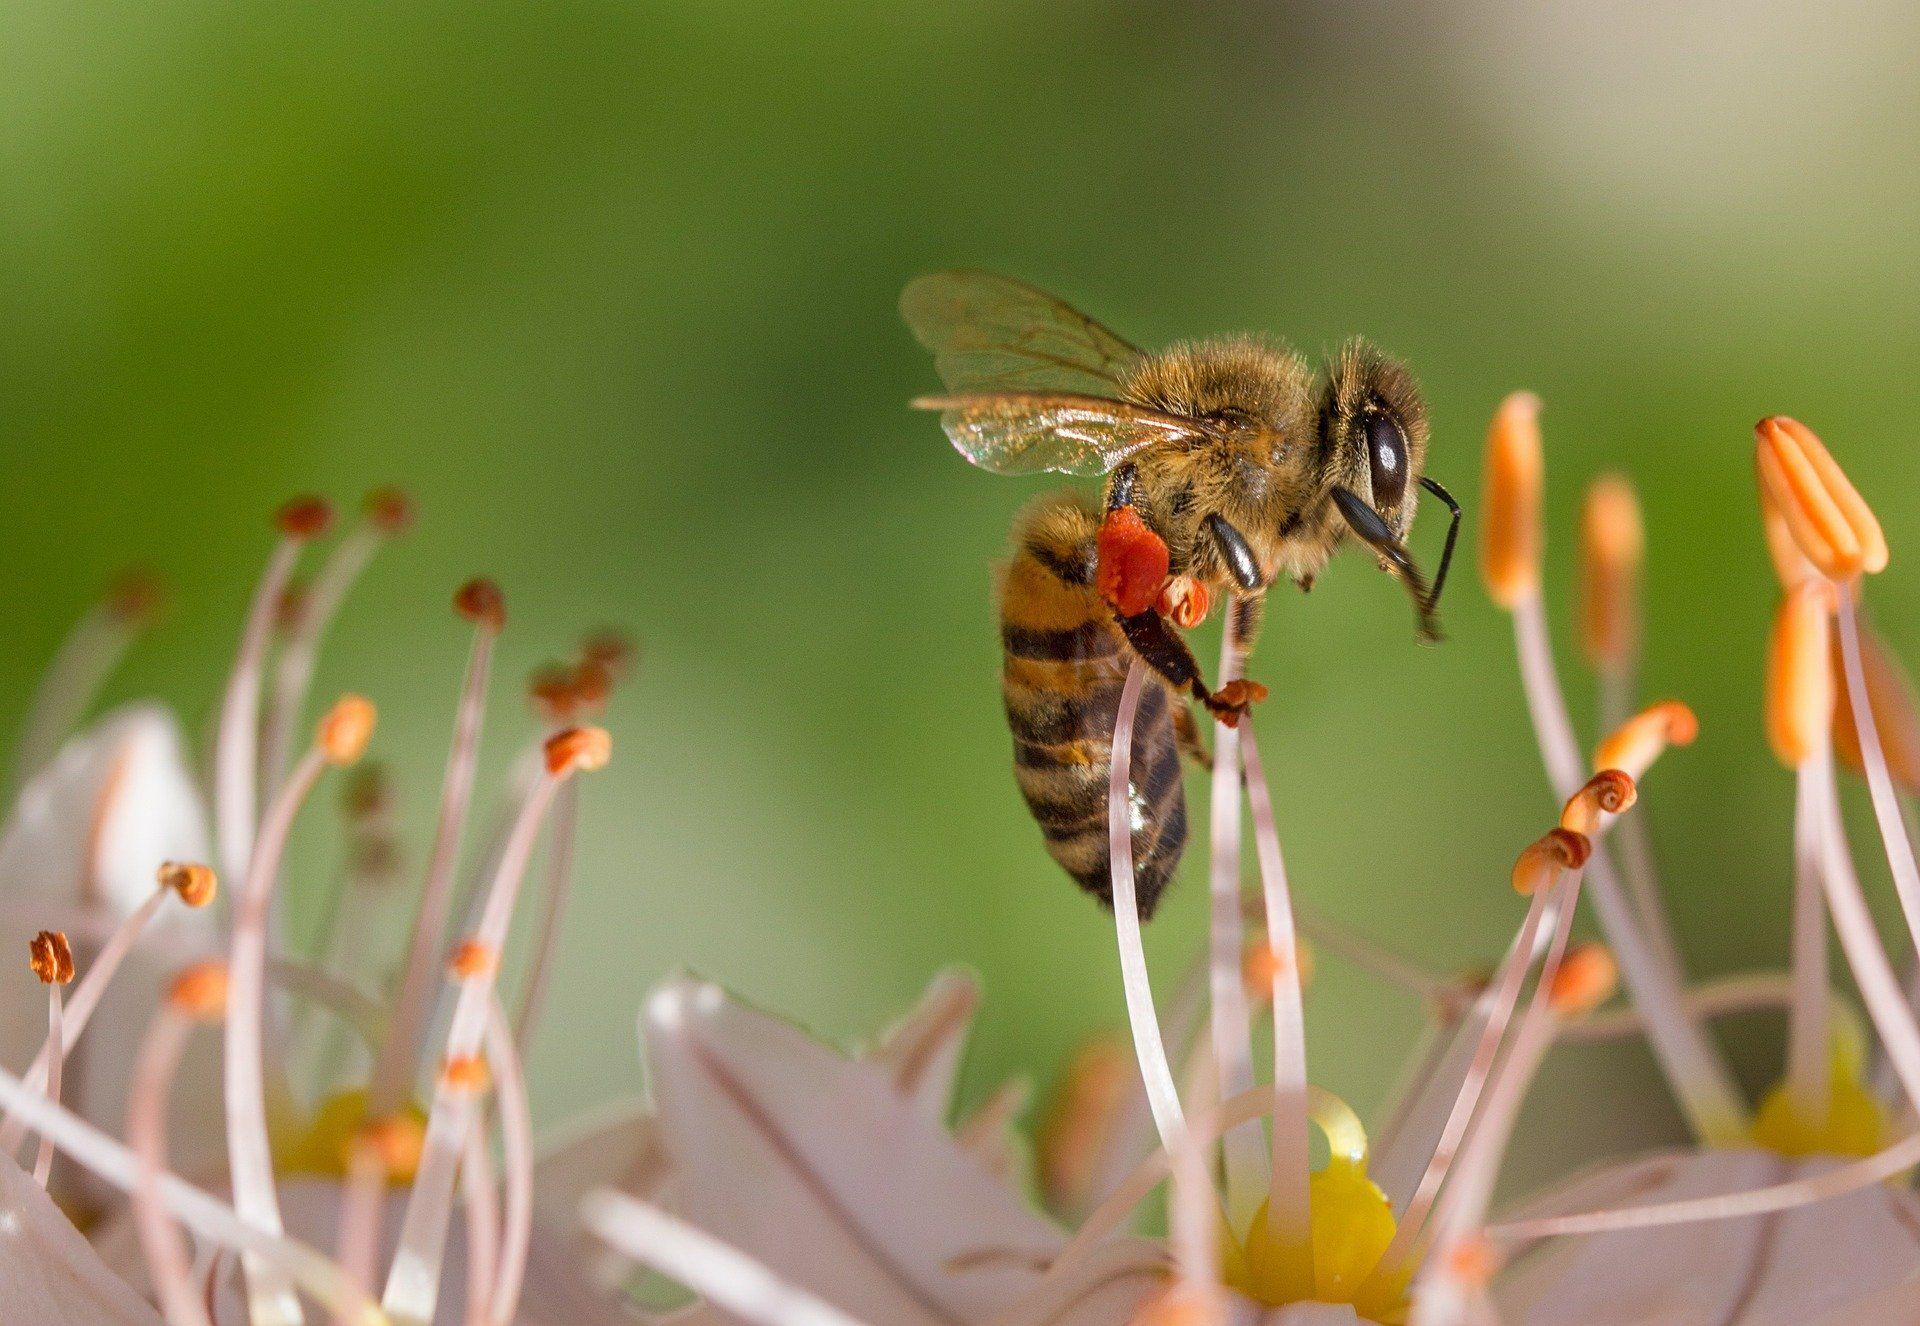 Смотреть фото пчелы онлайн